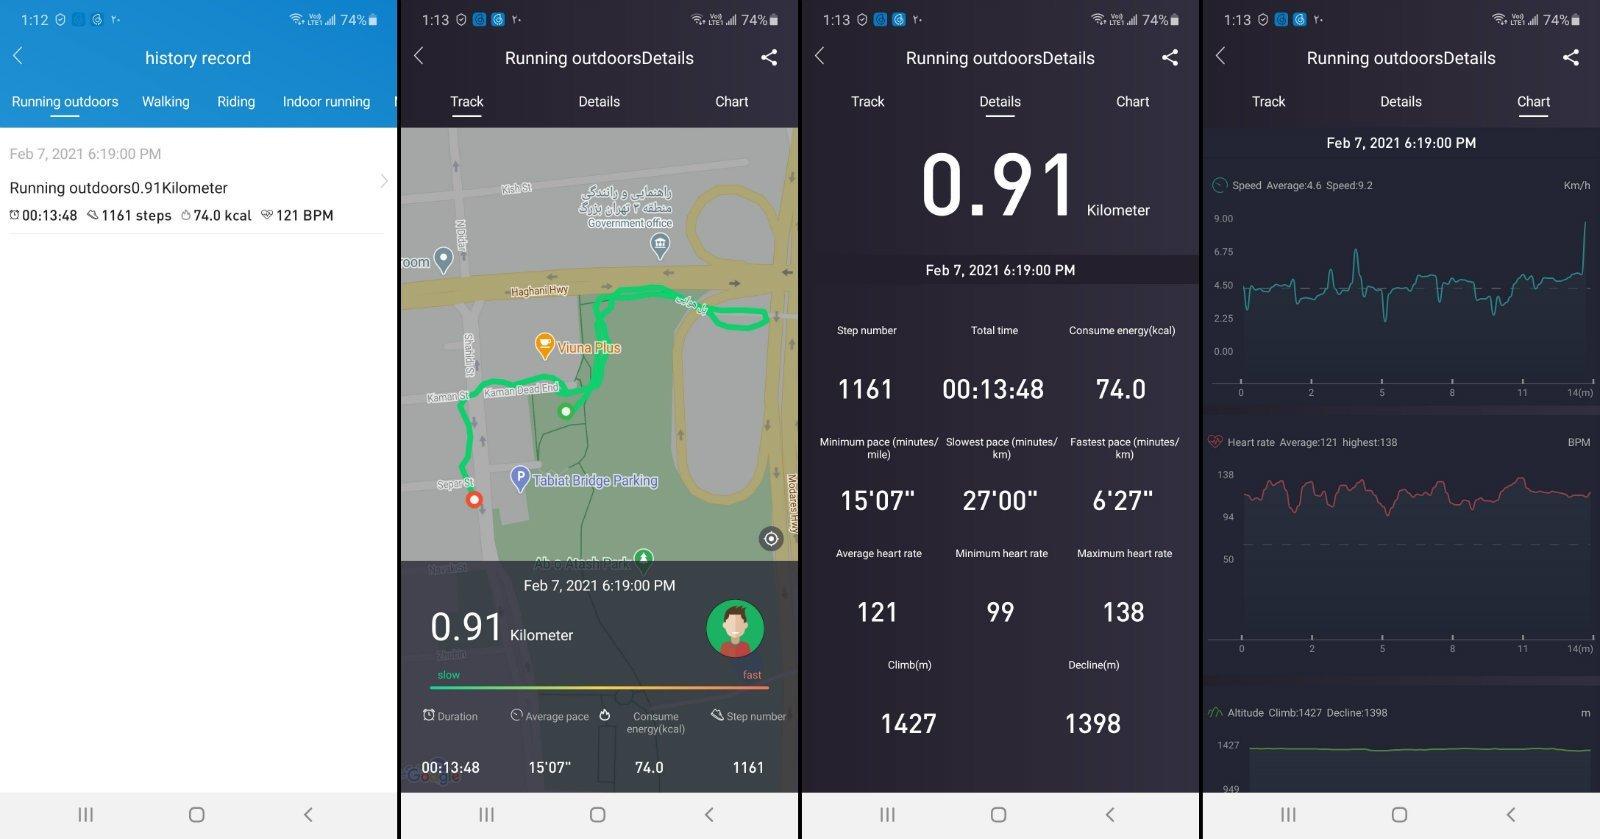 HaylouFit UI 3 w1600 بررسی ساعت هوشمند هایلو سولار؛ پر فروش و پر دردسر [تماشا کنید] اخبار IT